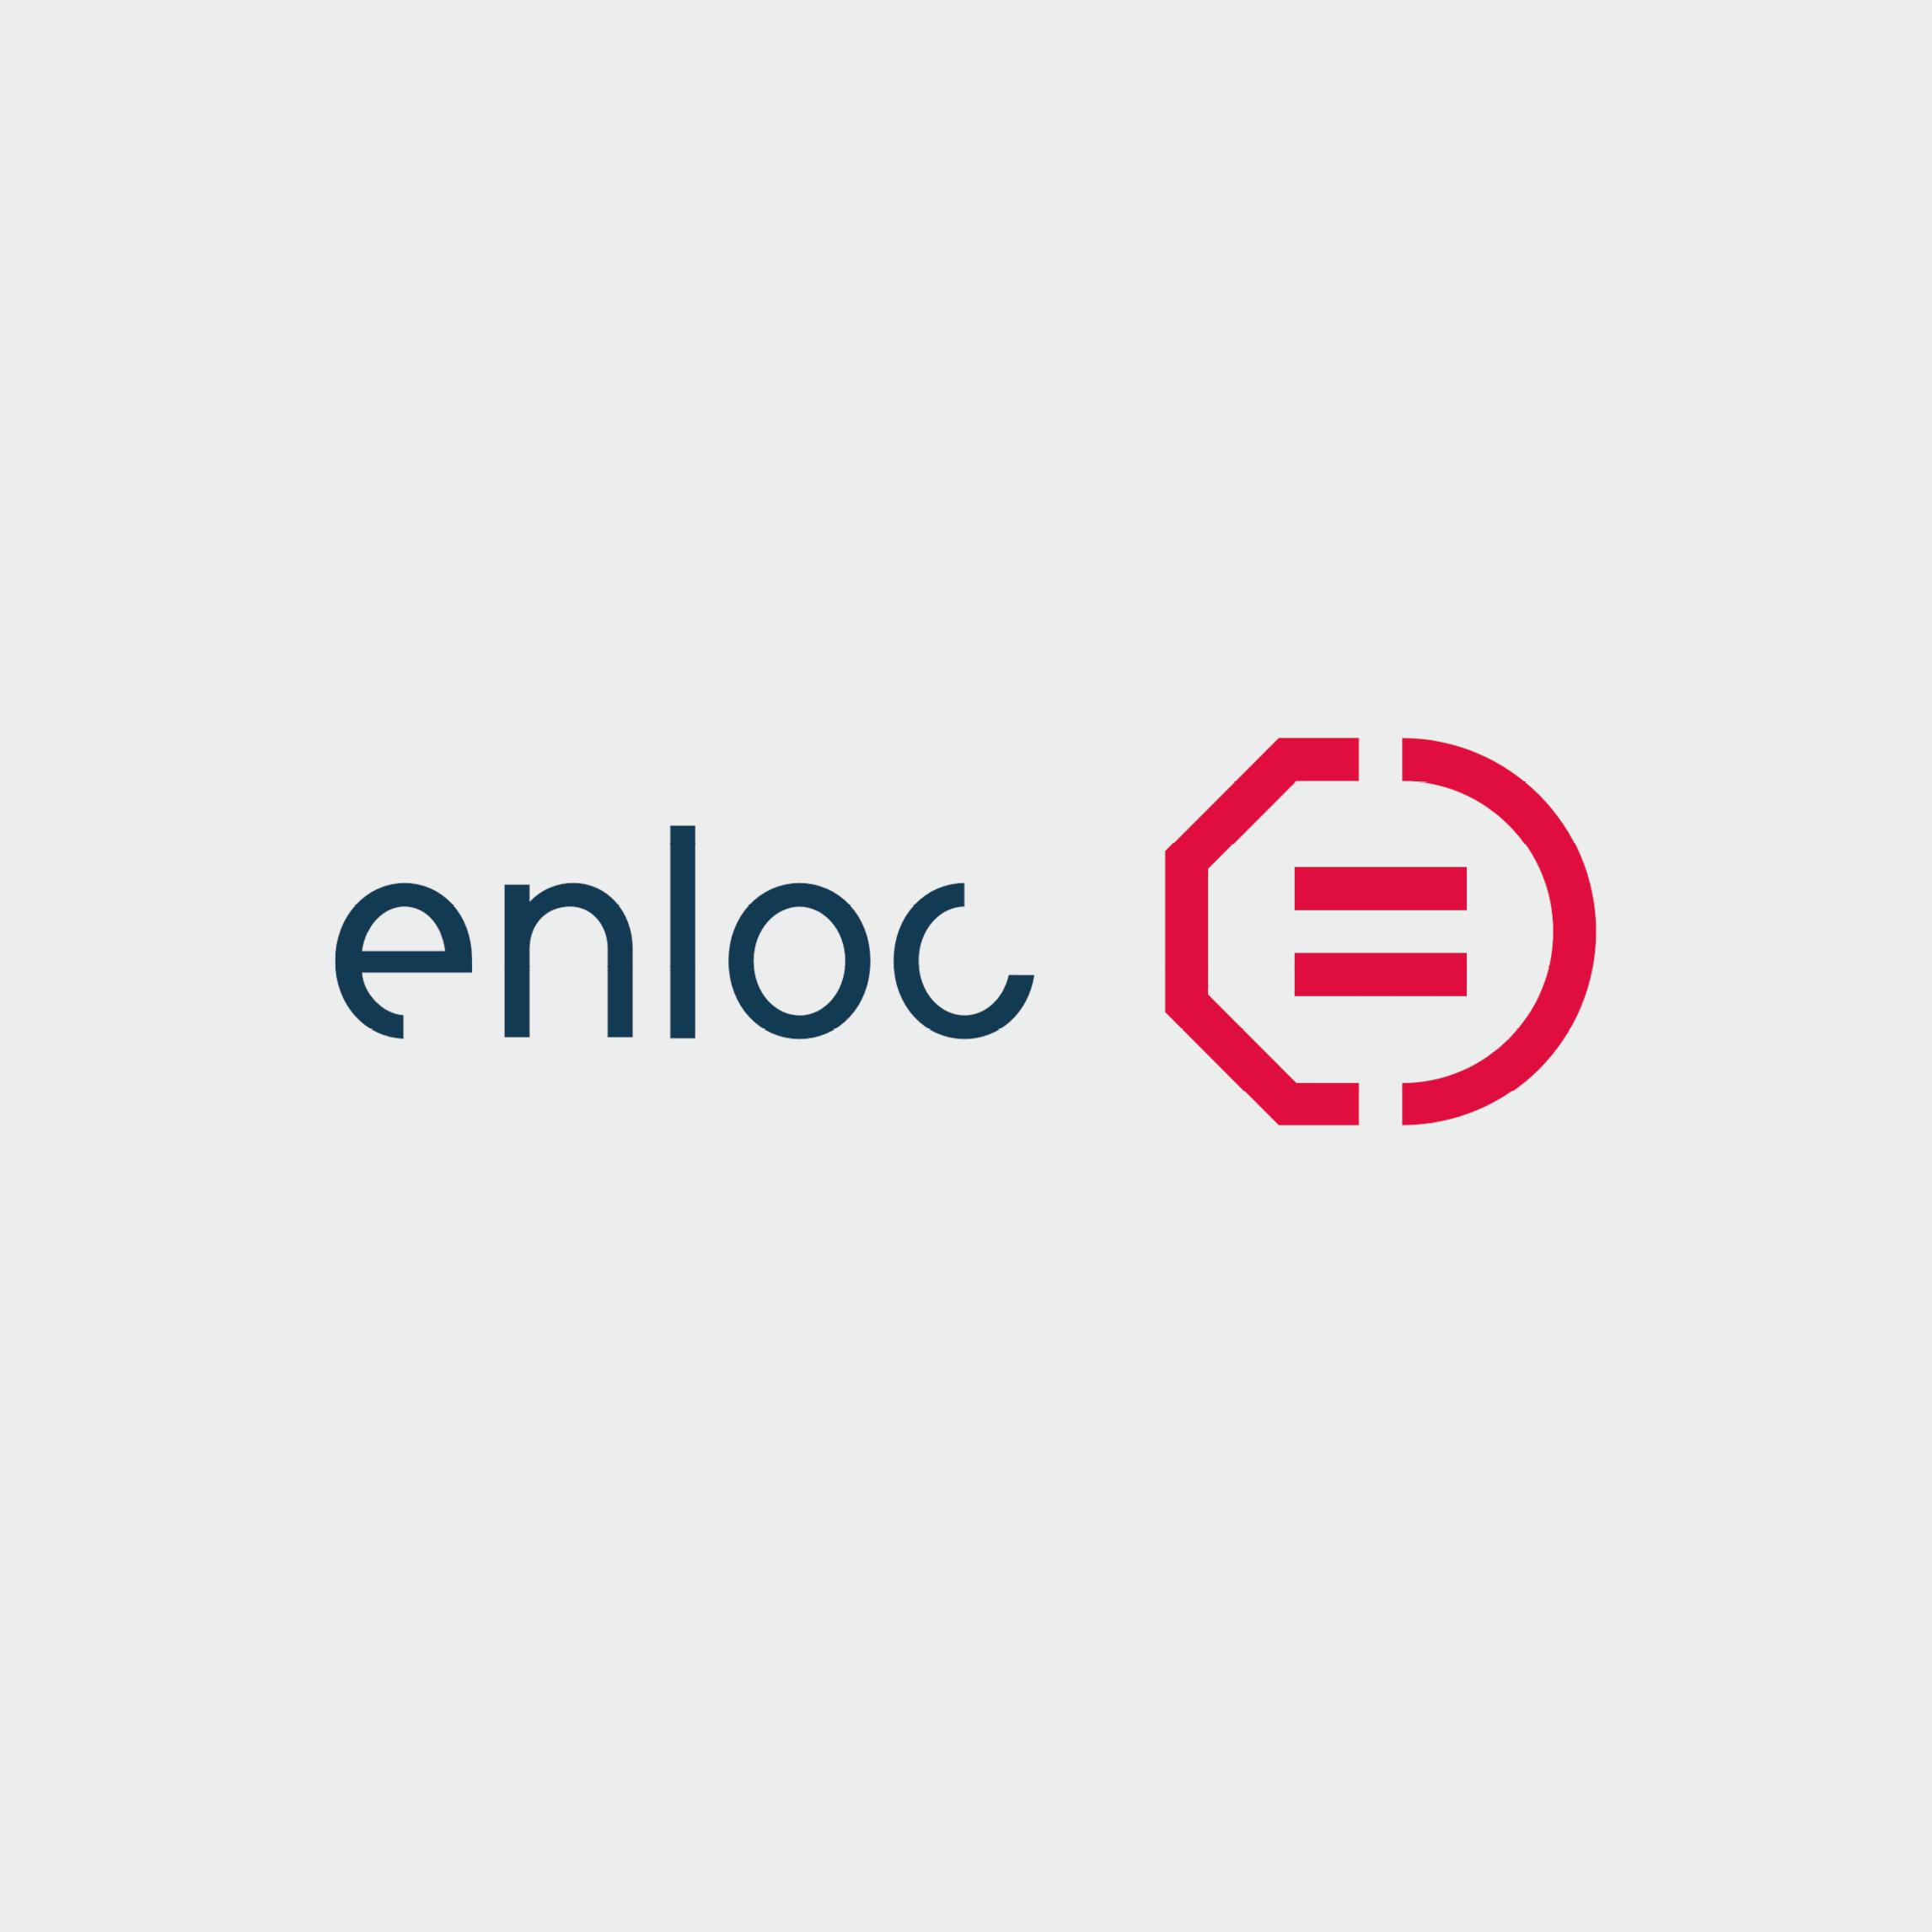 Referenzkunde Enloc Logo